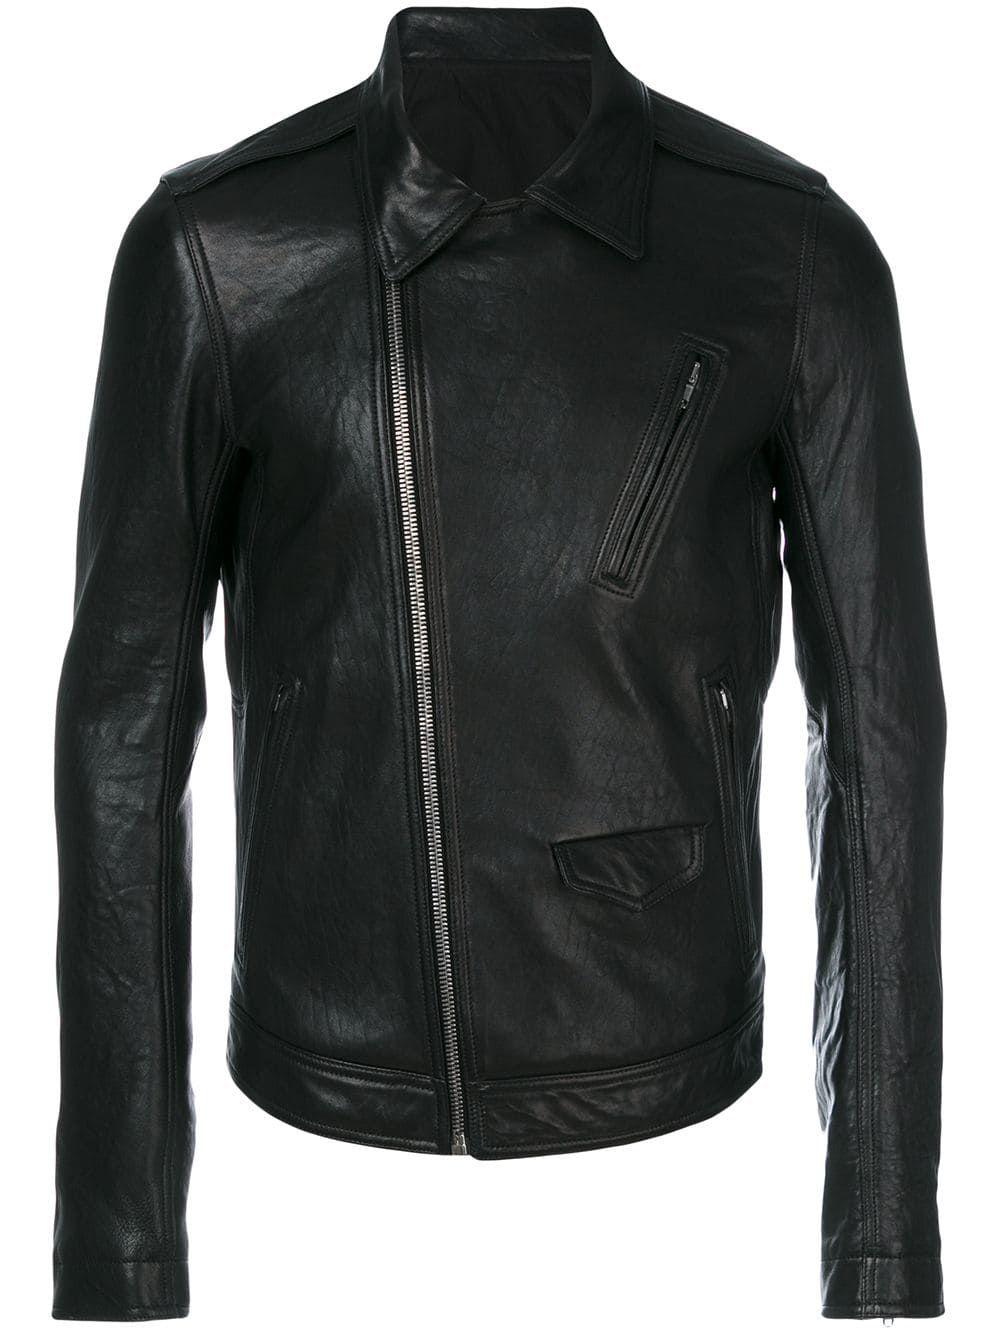 Offcenter zip fastening jacket Jackets, Leather jacket